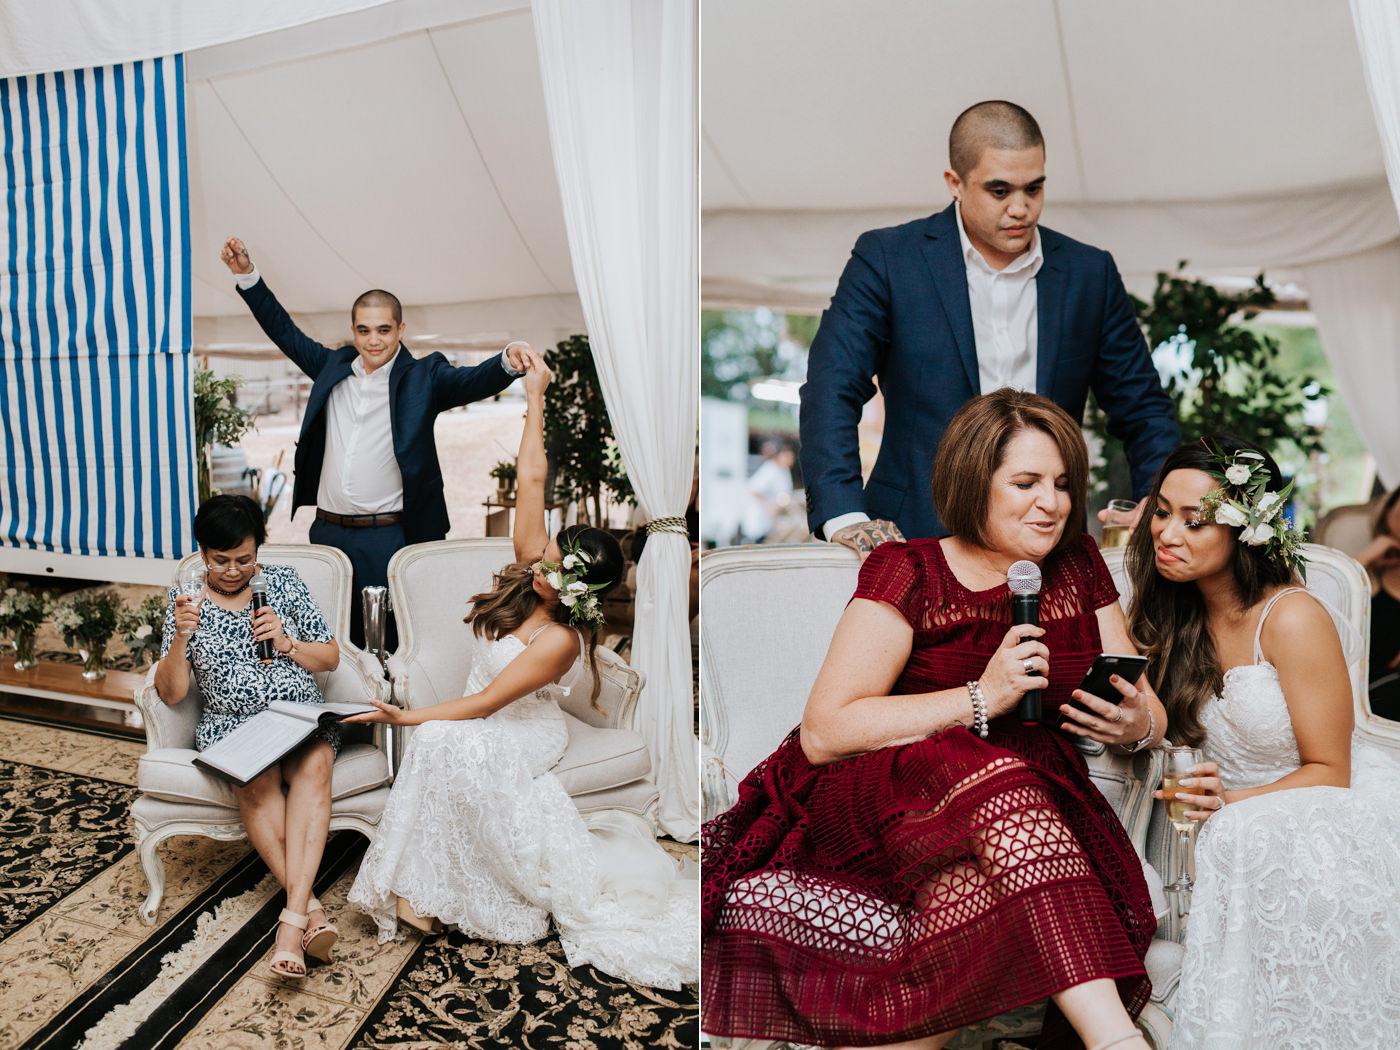 Nick & Vanezza - Fernbank Farm Wedding - Samantha Heather Photography-142.jpg